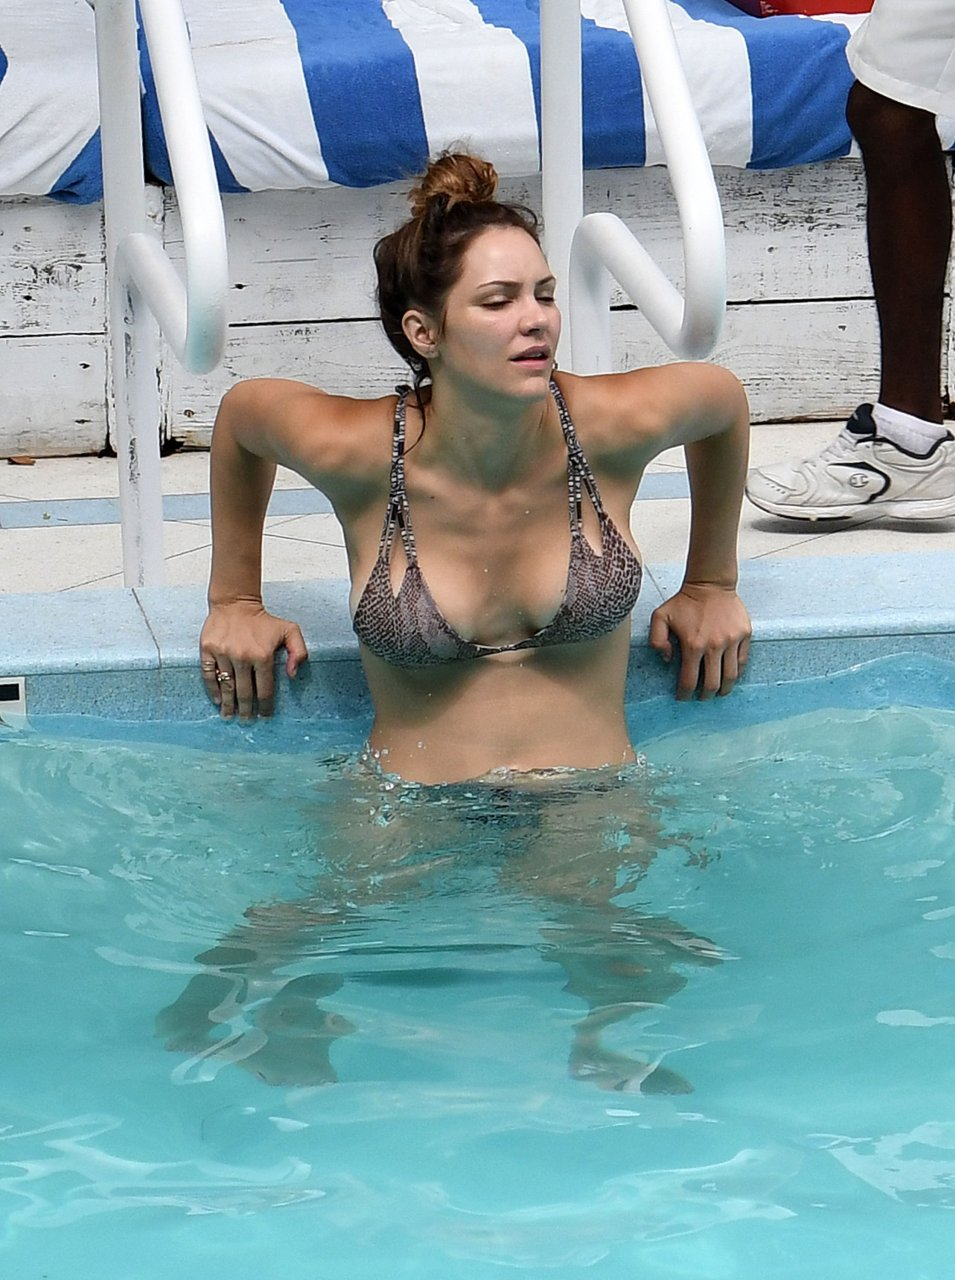 Martine mccutcheon tits